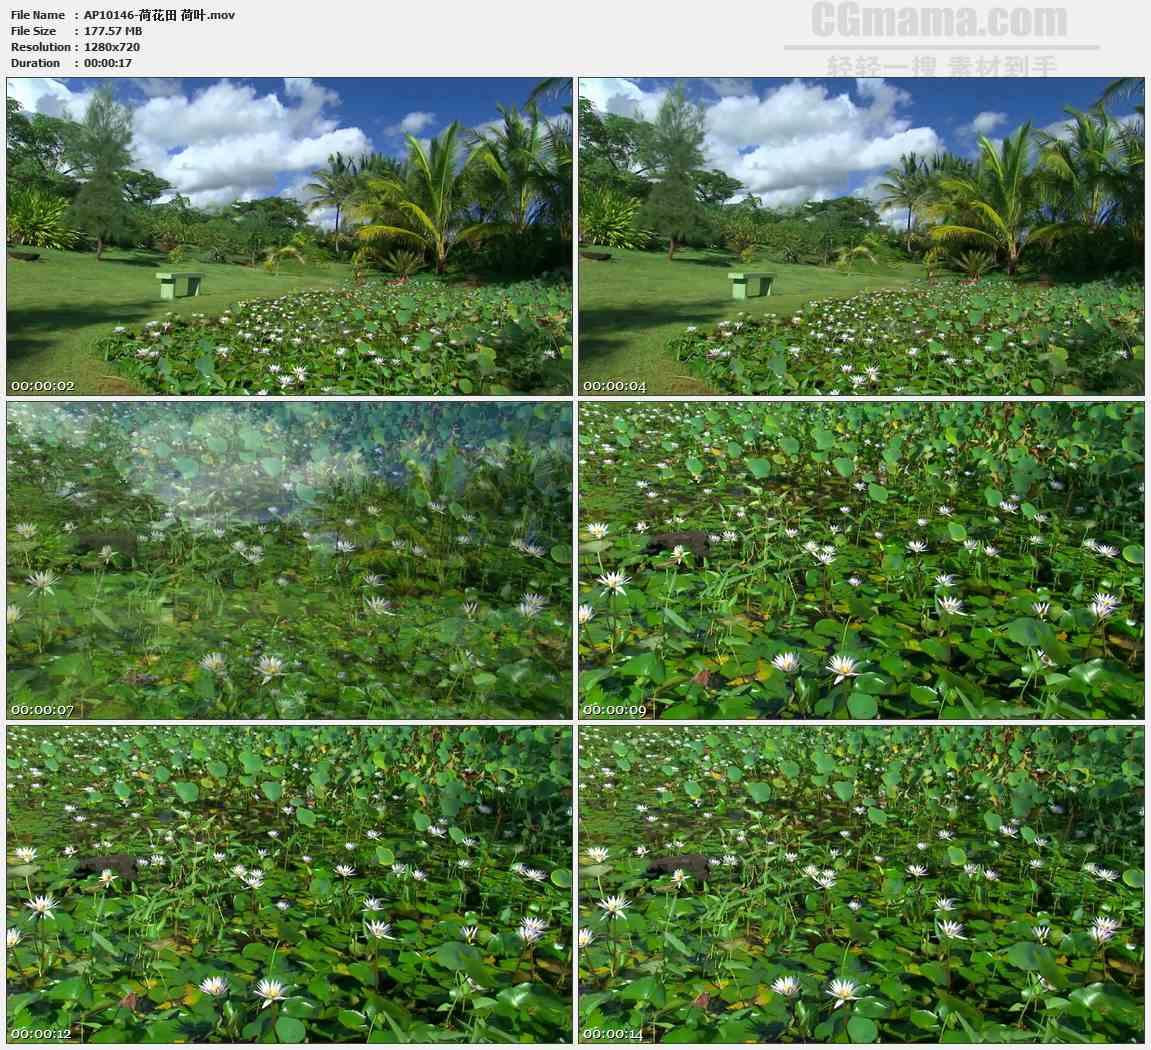 AP10146-荷塘睡莲高清实拍视频素材